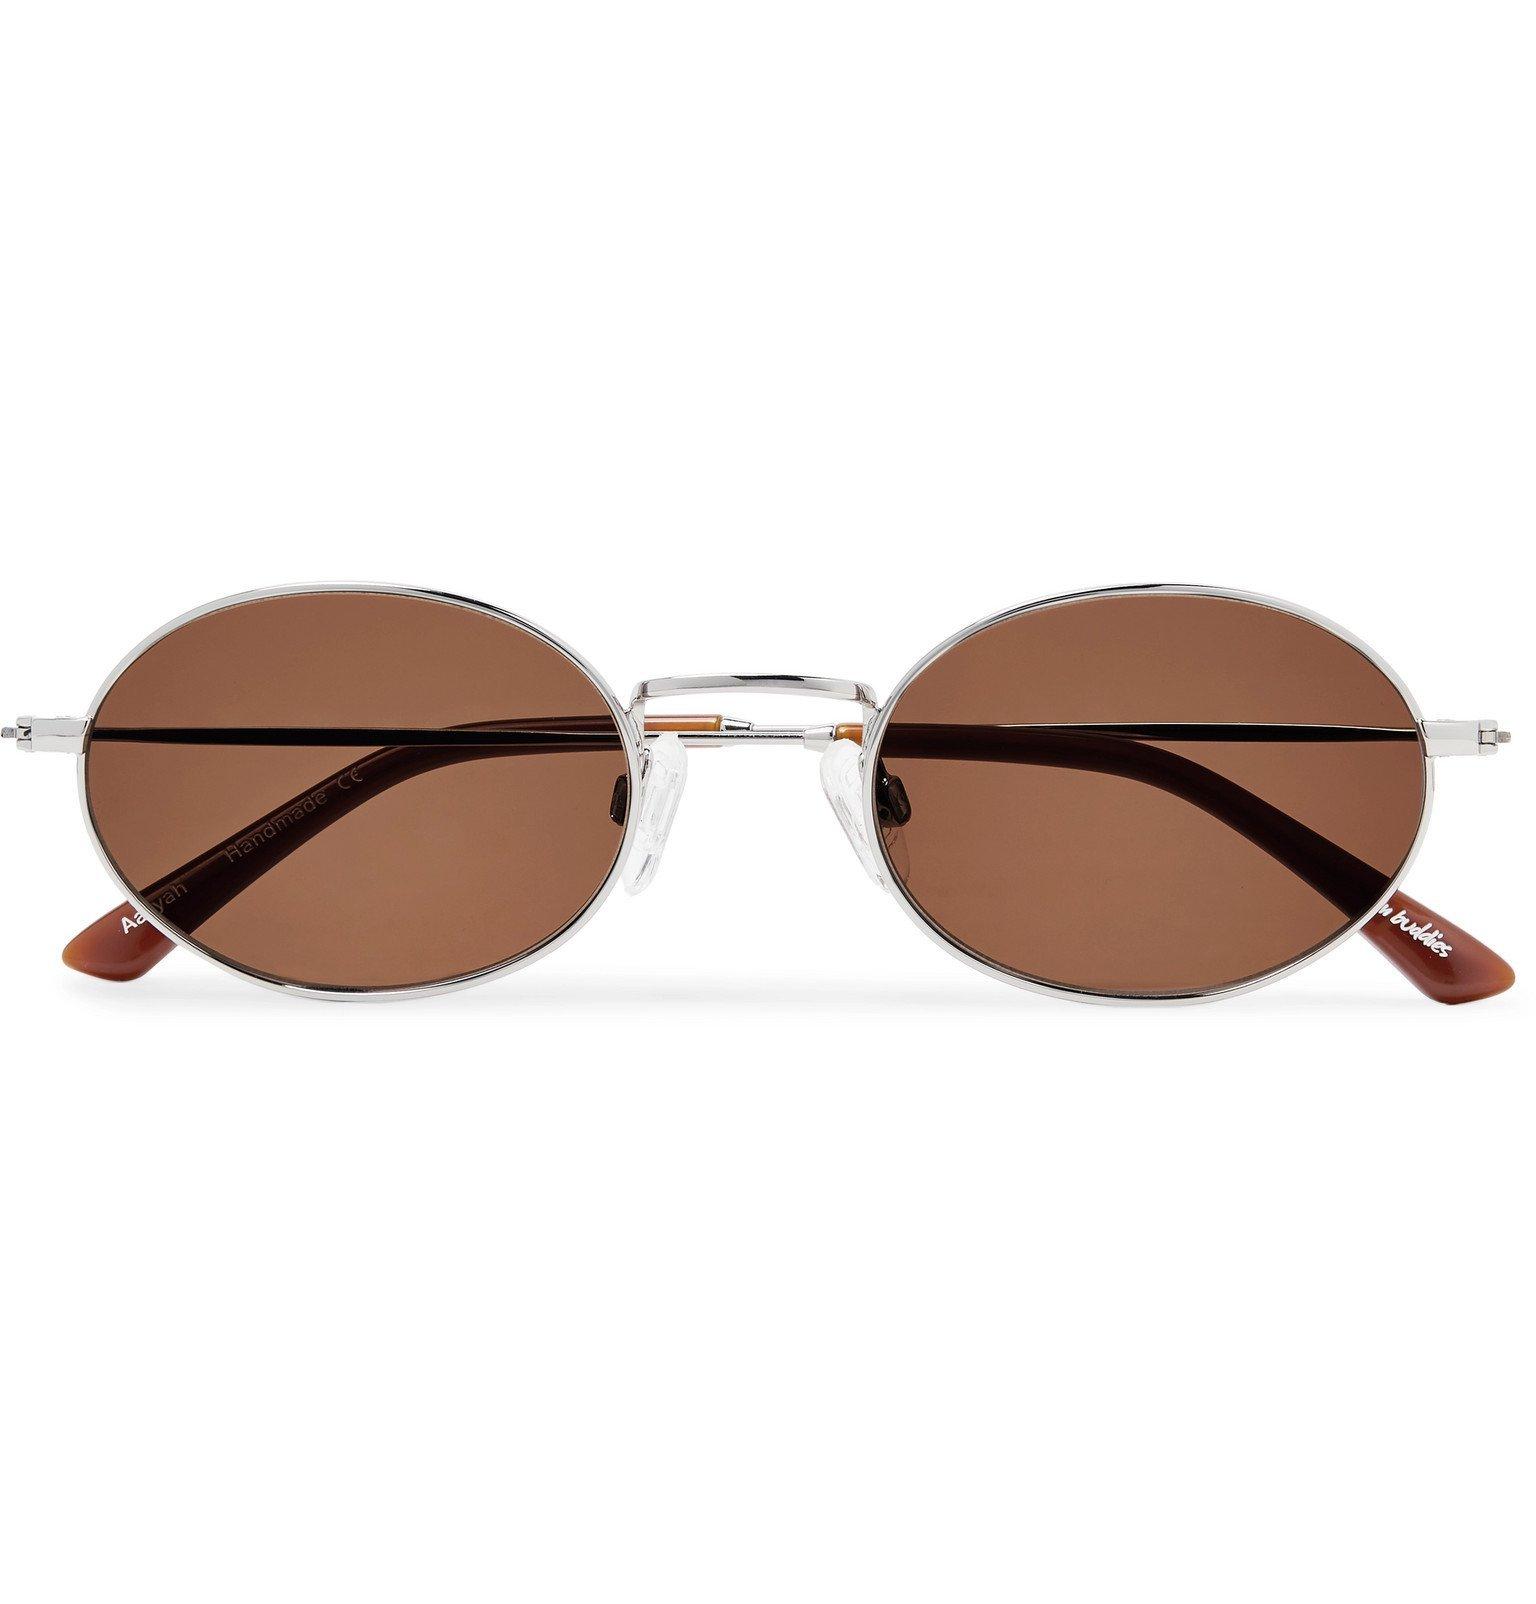 Photo: Sun Buddies - Oval-Frame Silver-Tone Sunglasses - Silver